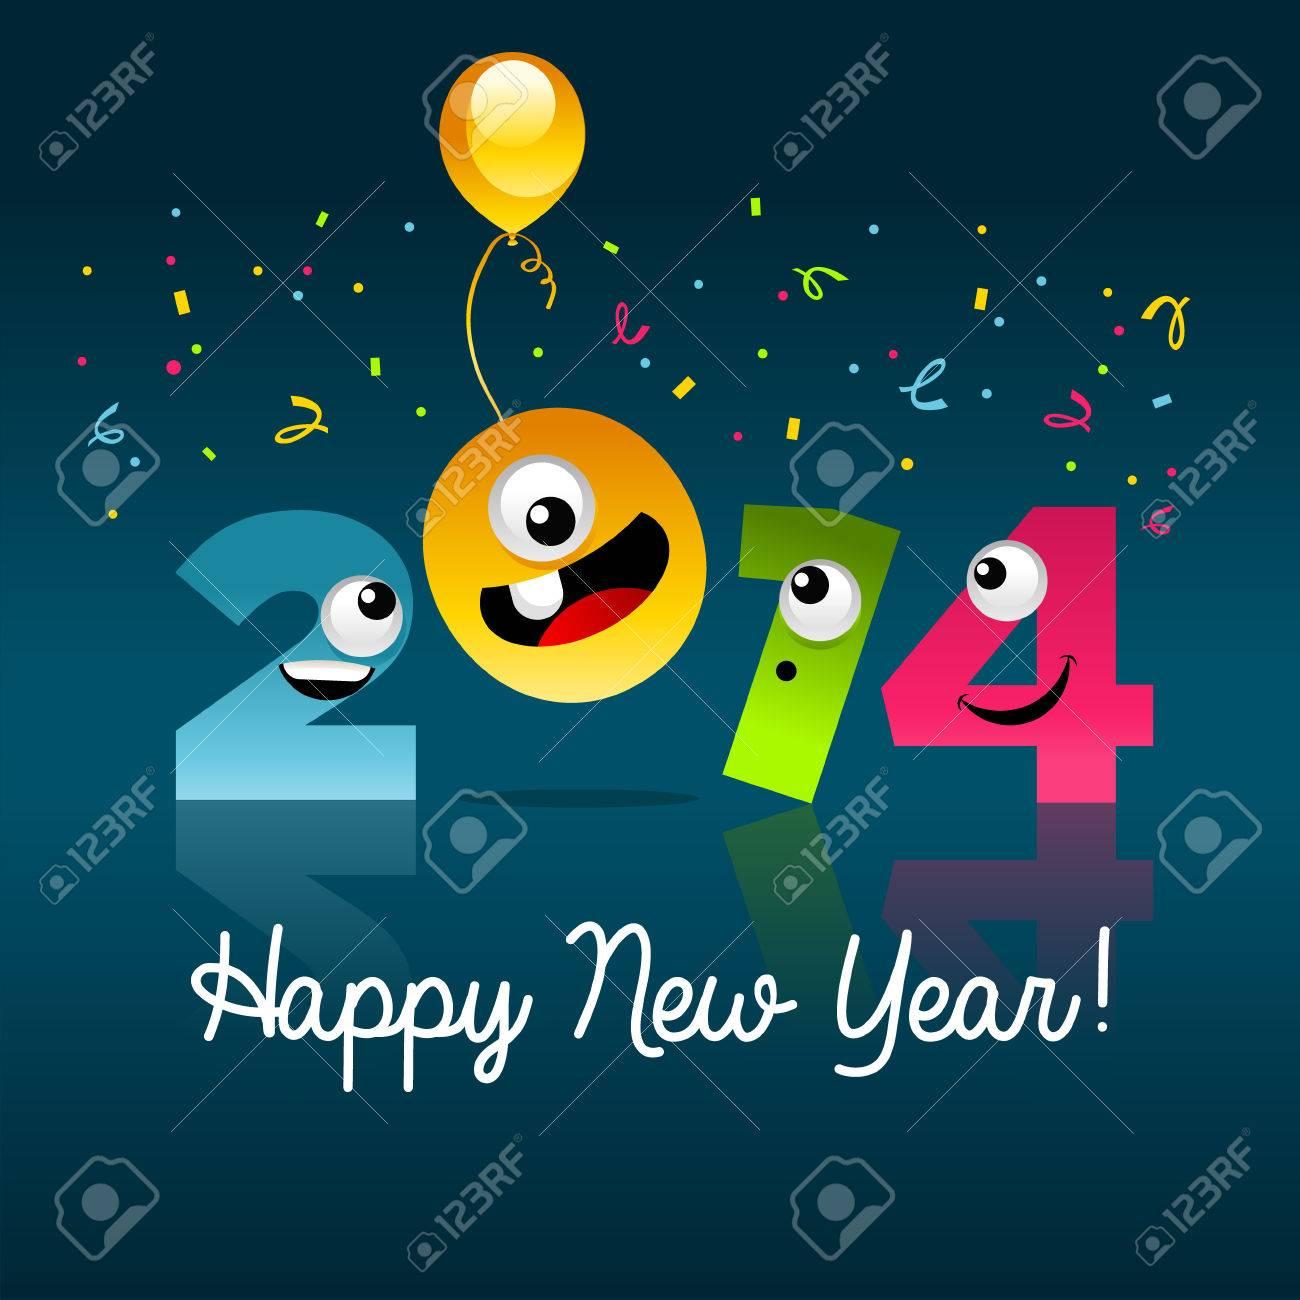 Colorful new year 2014 cartoon illustration Stock Vector - 22705081